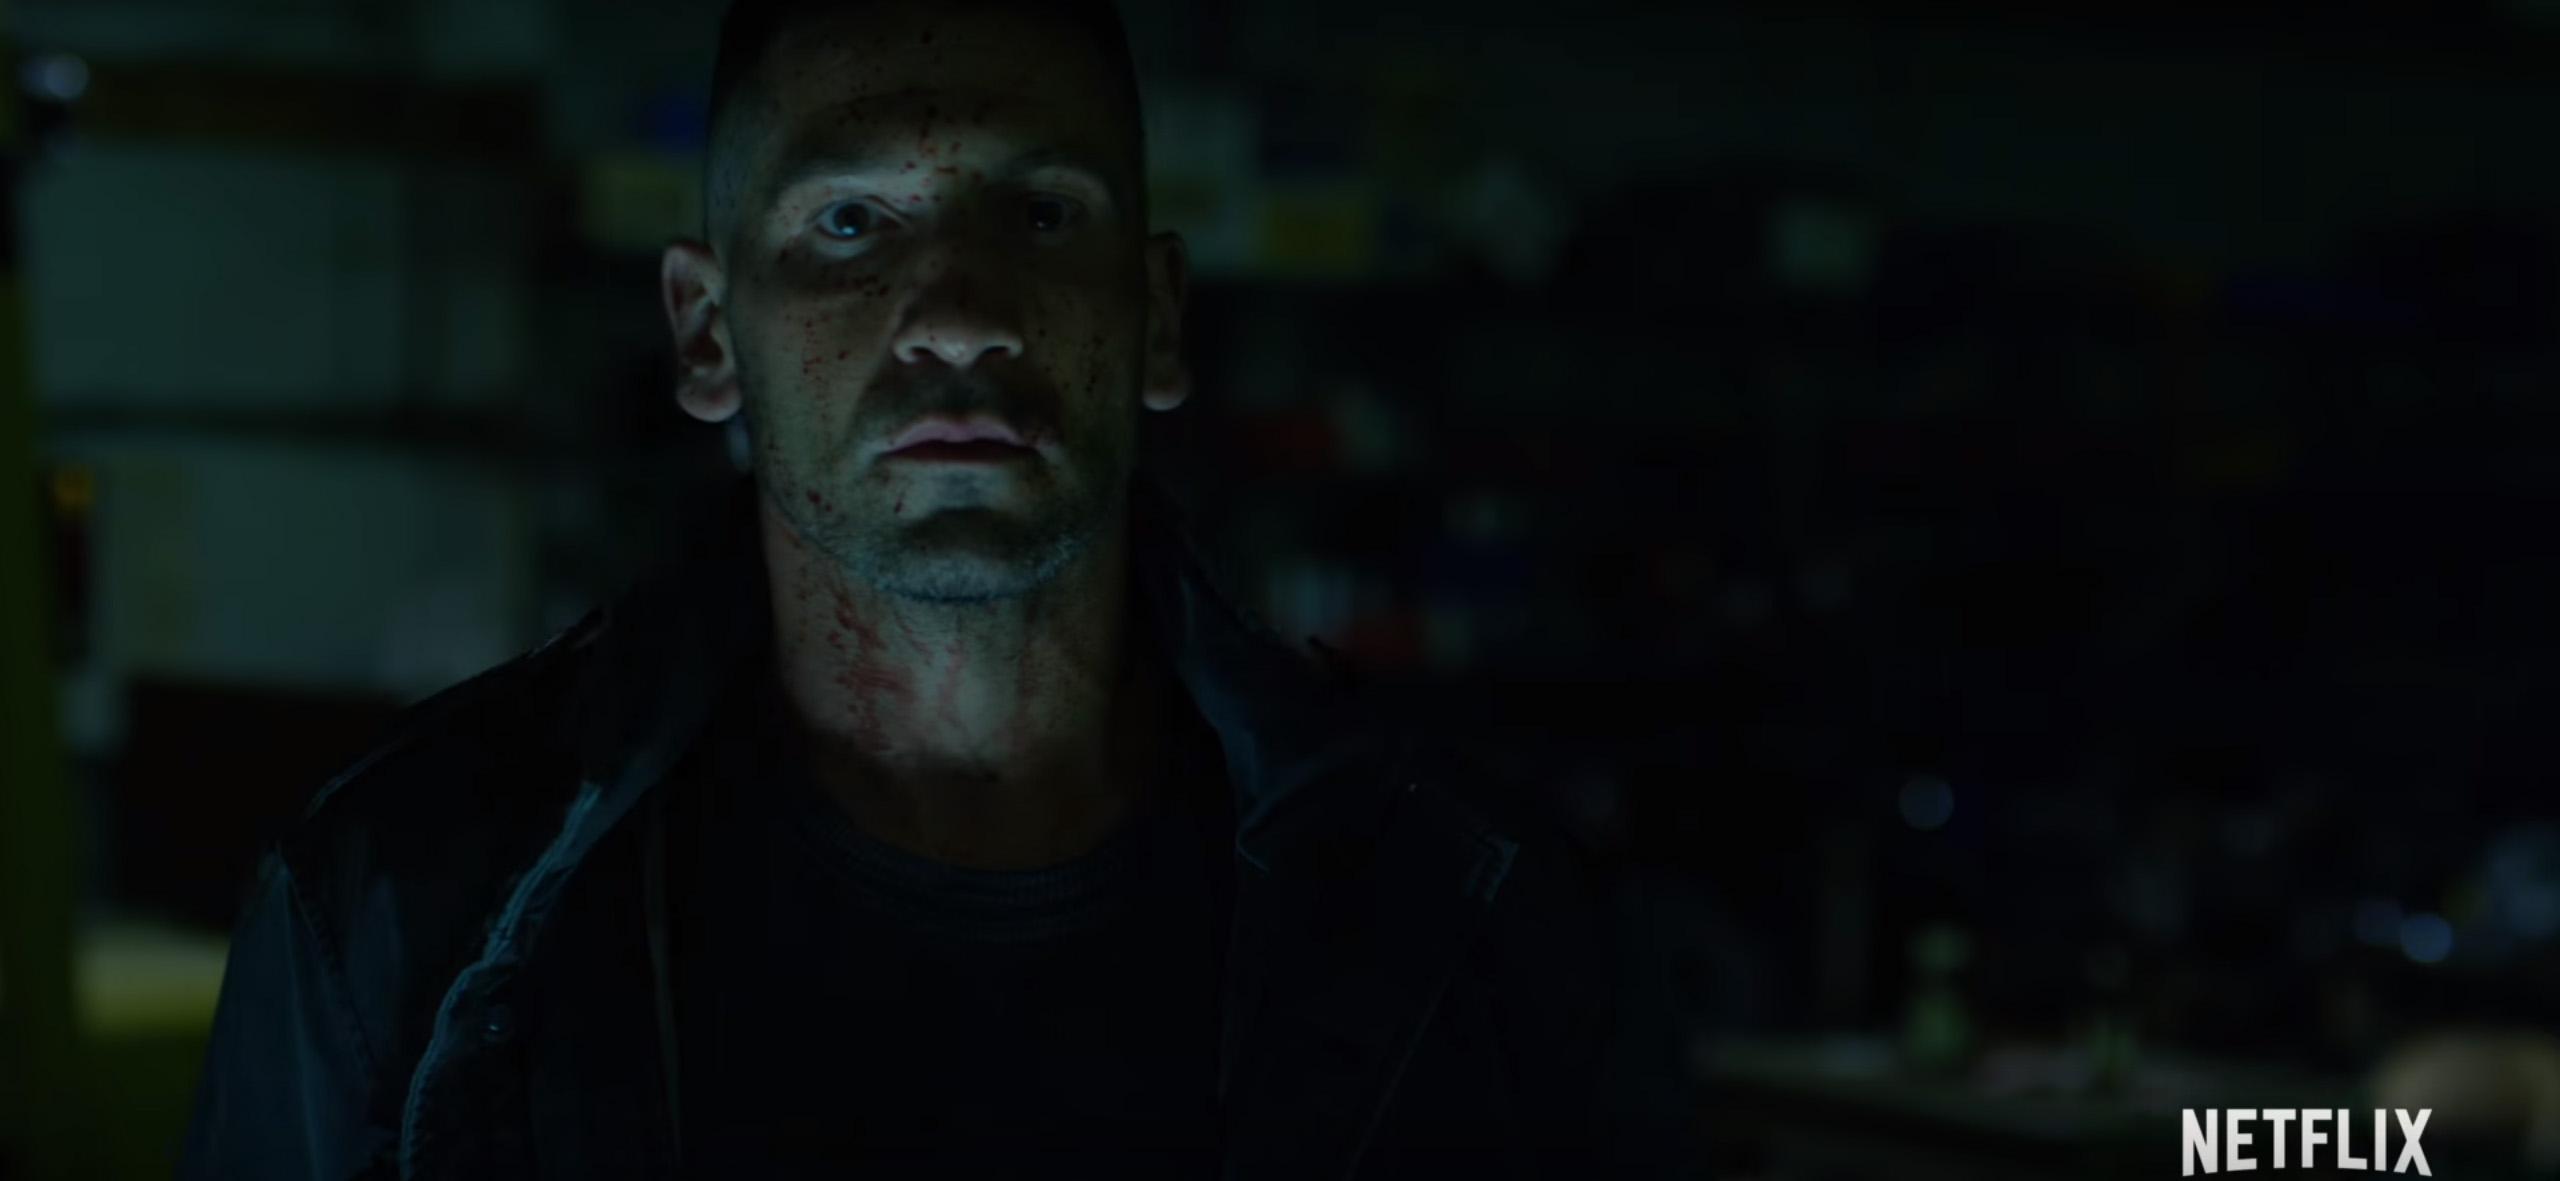 Jon Bernthal in Daredevil Season 2